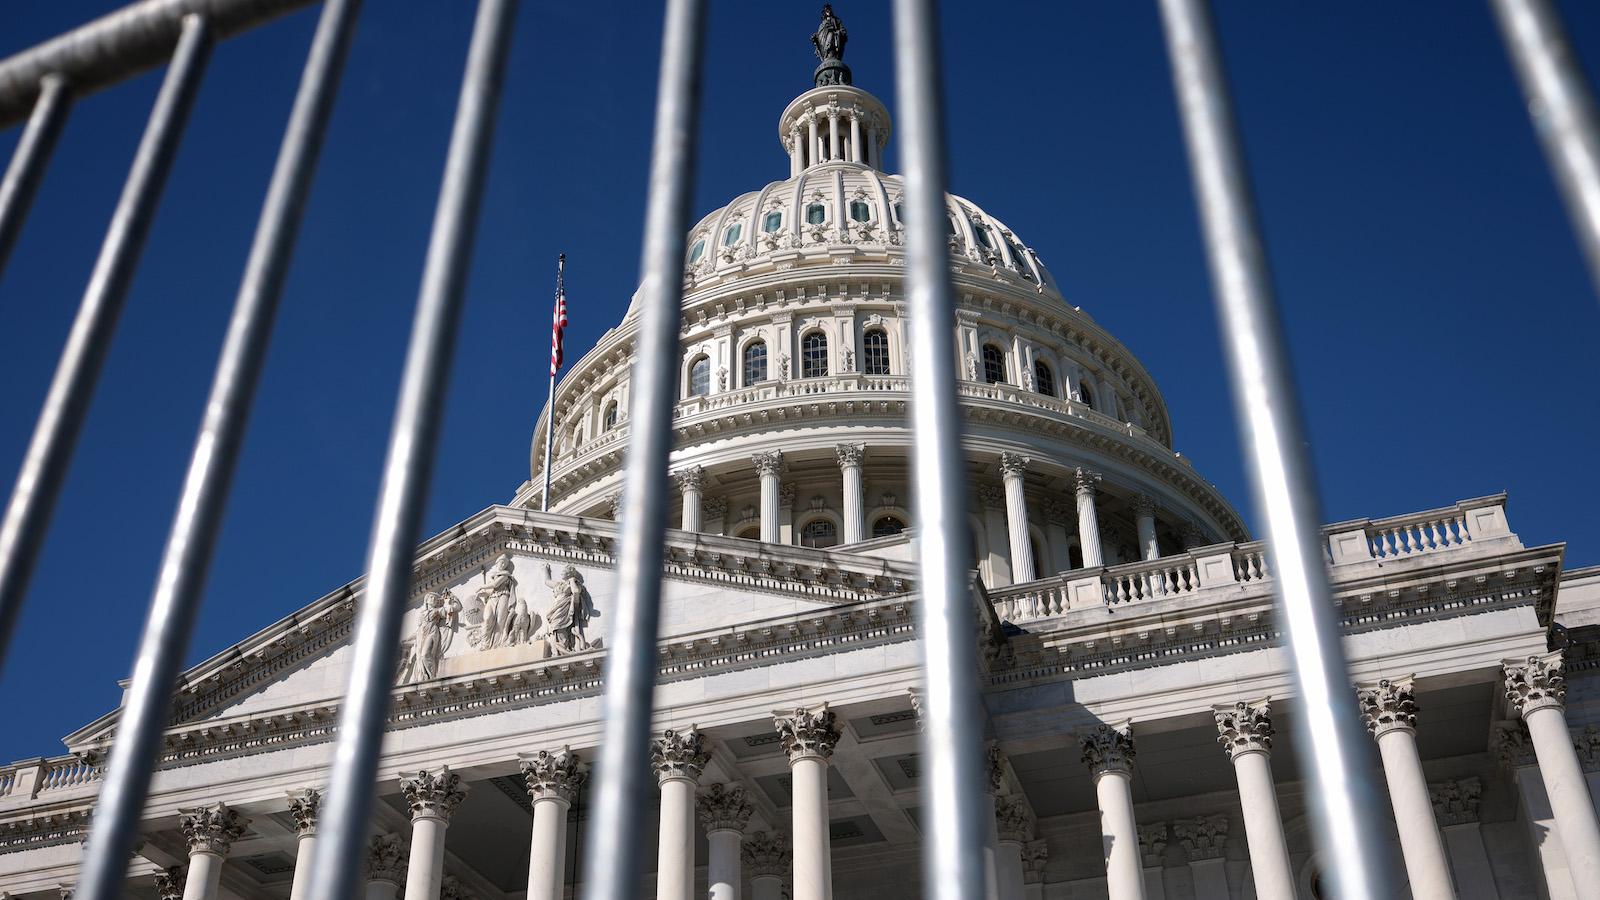 Capitol building through a fence